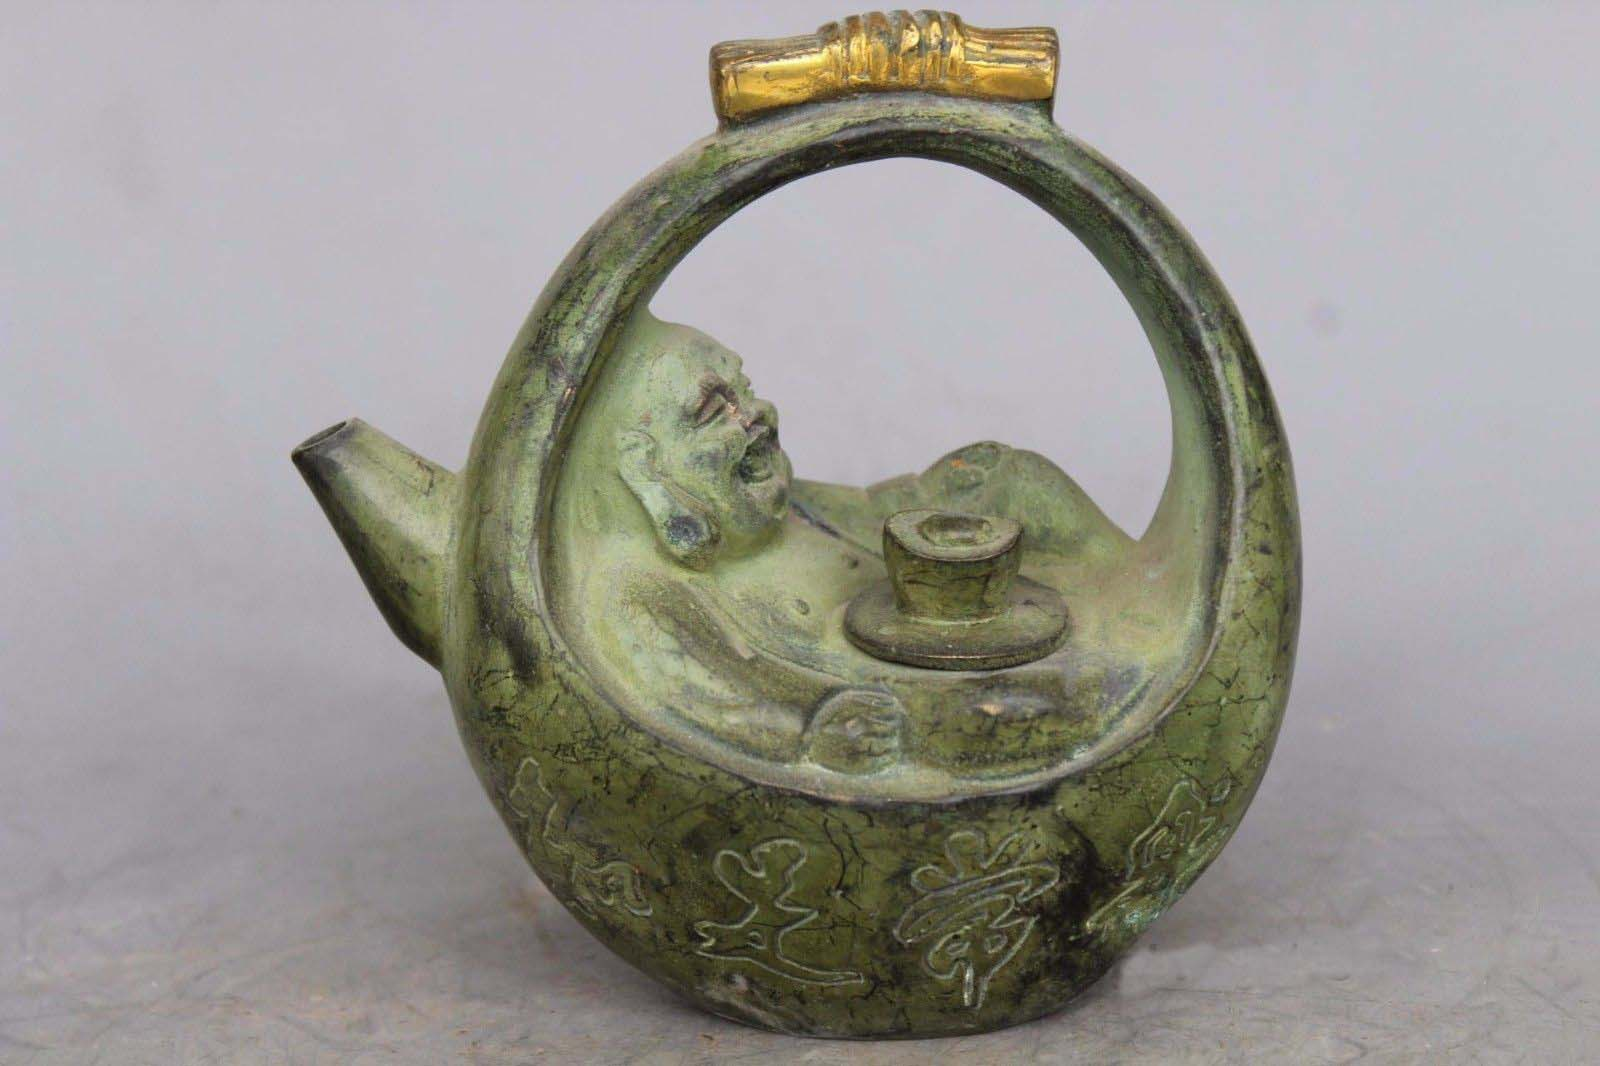 6Old Chinese buddhism Bronze gilt wealth Maitreya Buddha Wine TeaPot Flagon6Old Chinese buddhism Bronze gilt wealth Maitreya Buddha Wine TeaPot Flagon